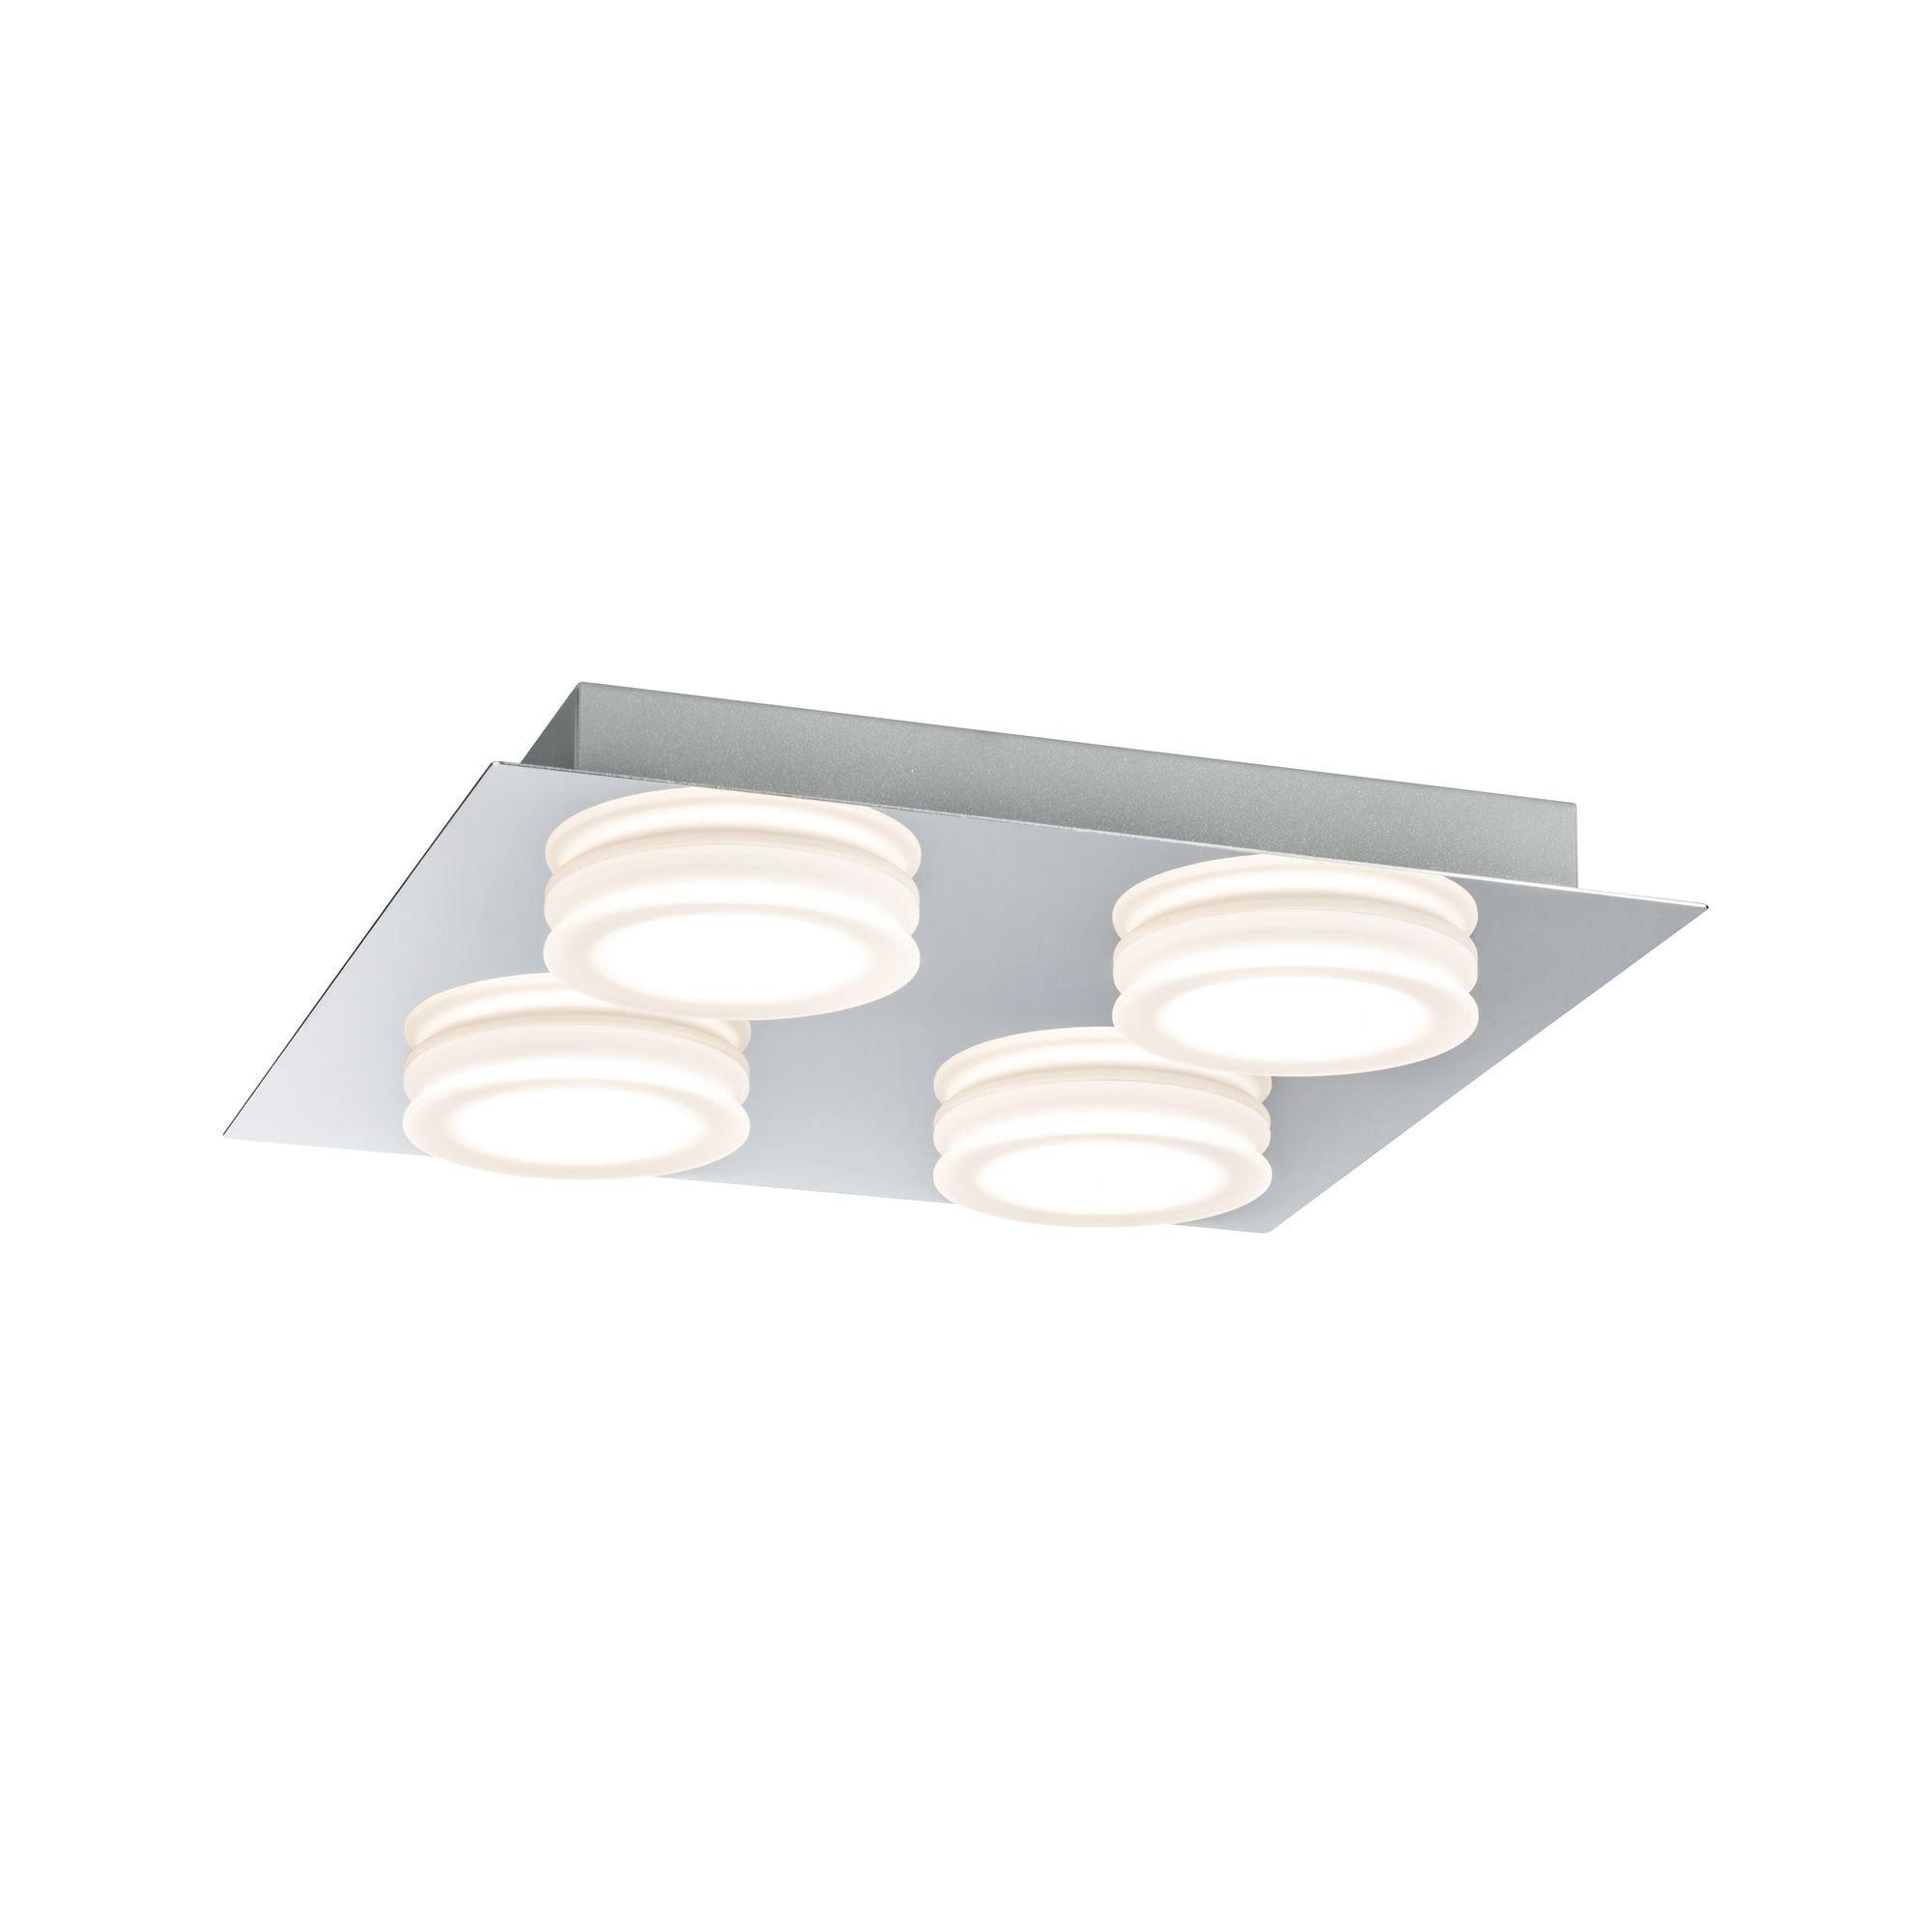 Paulmann,LED Deckenleuchte Doradus 4x5W Chrom